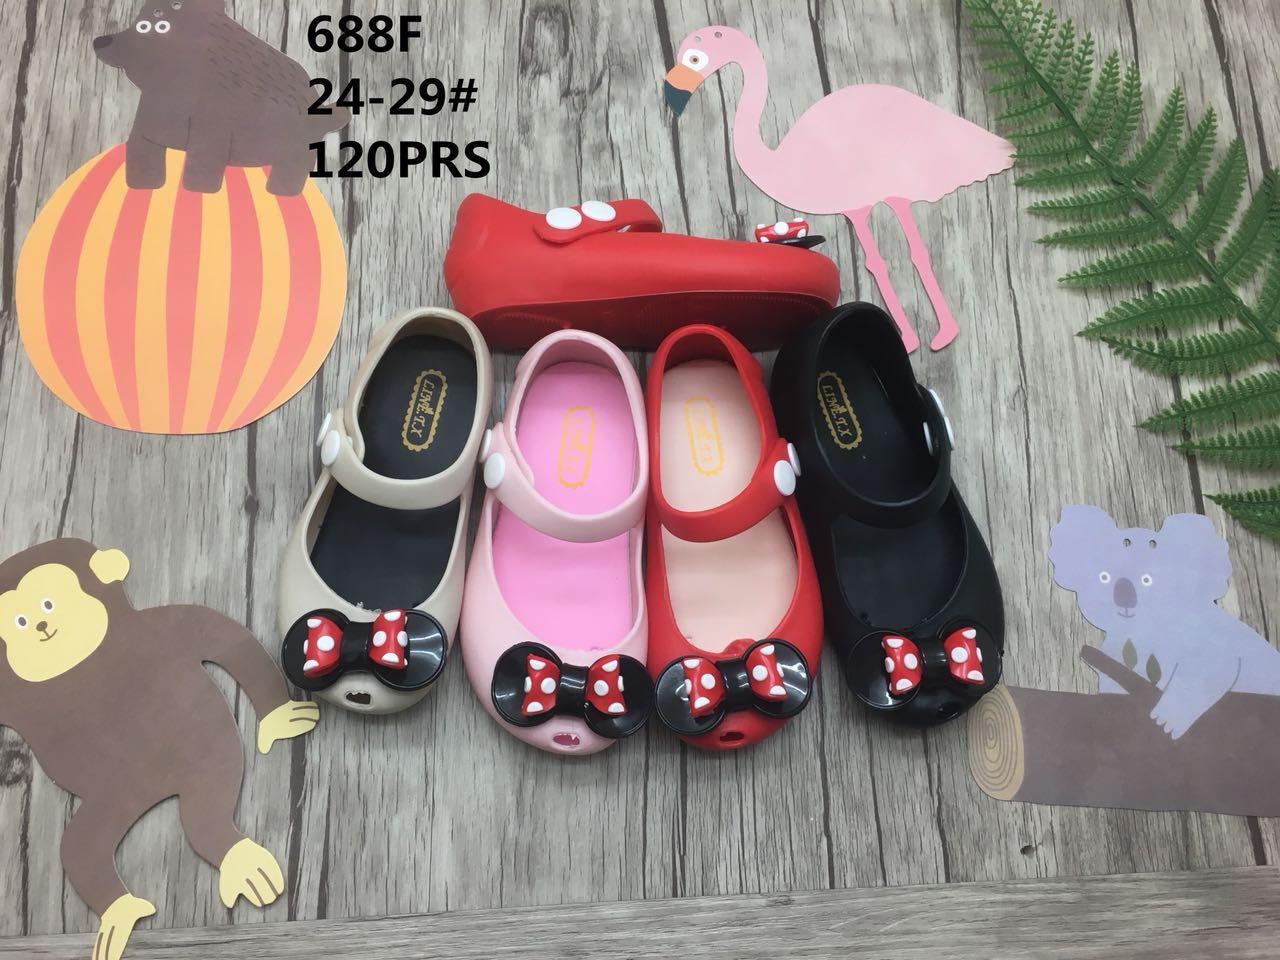 Sepatu Sekolah Sandal Anak Balita Perempuan Slip On Bayi Dan Cewek  Mickey Jelly Shoes 1 5 Thn Aksen Pita Tg15